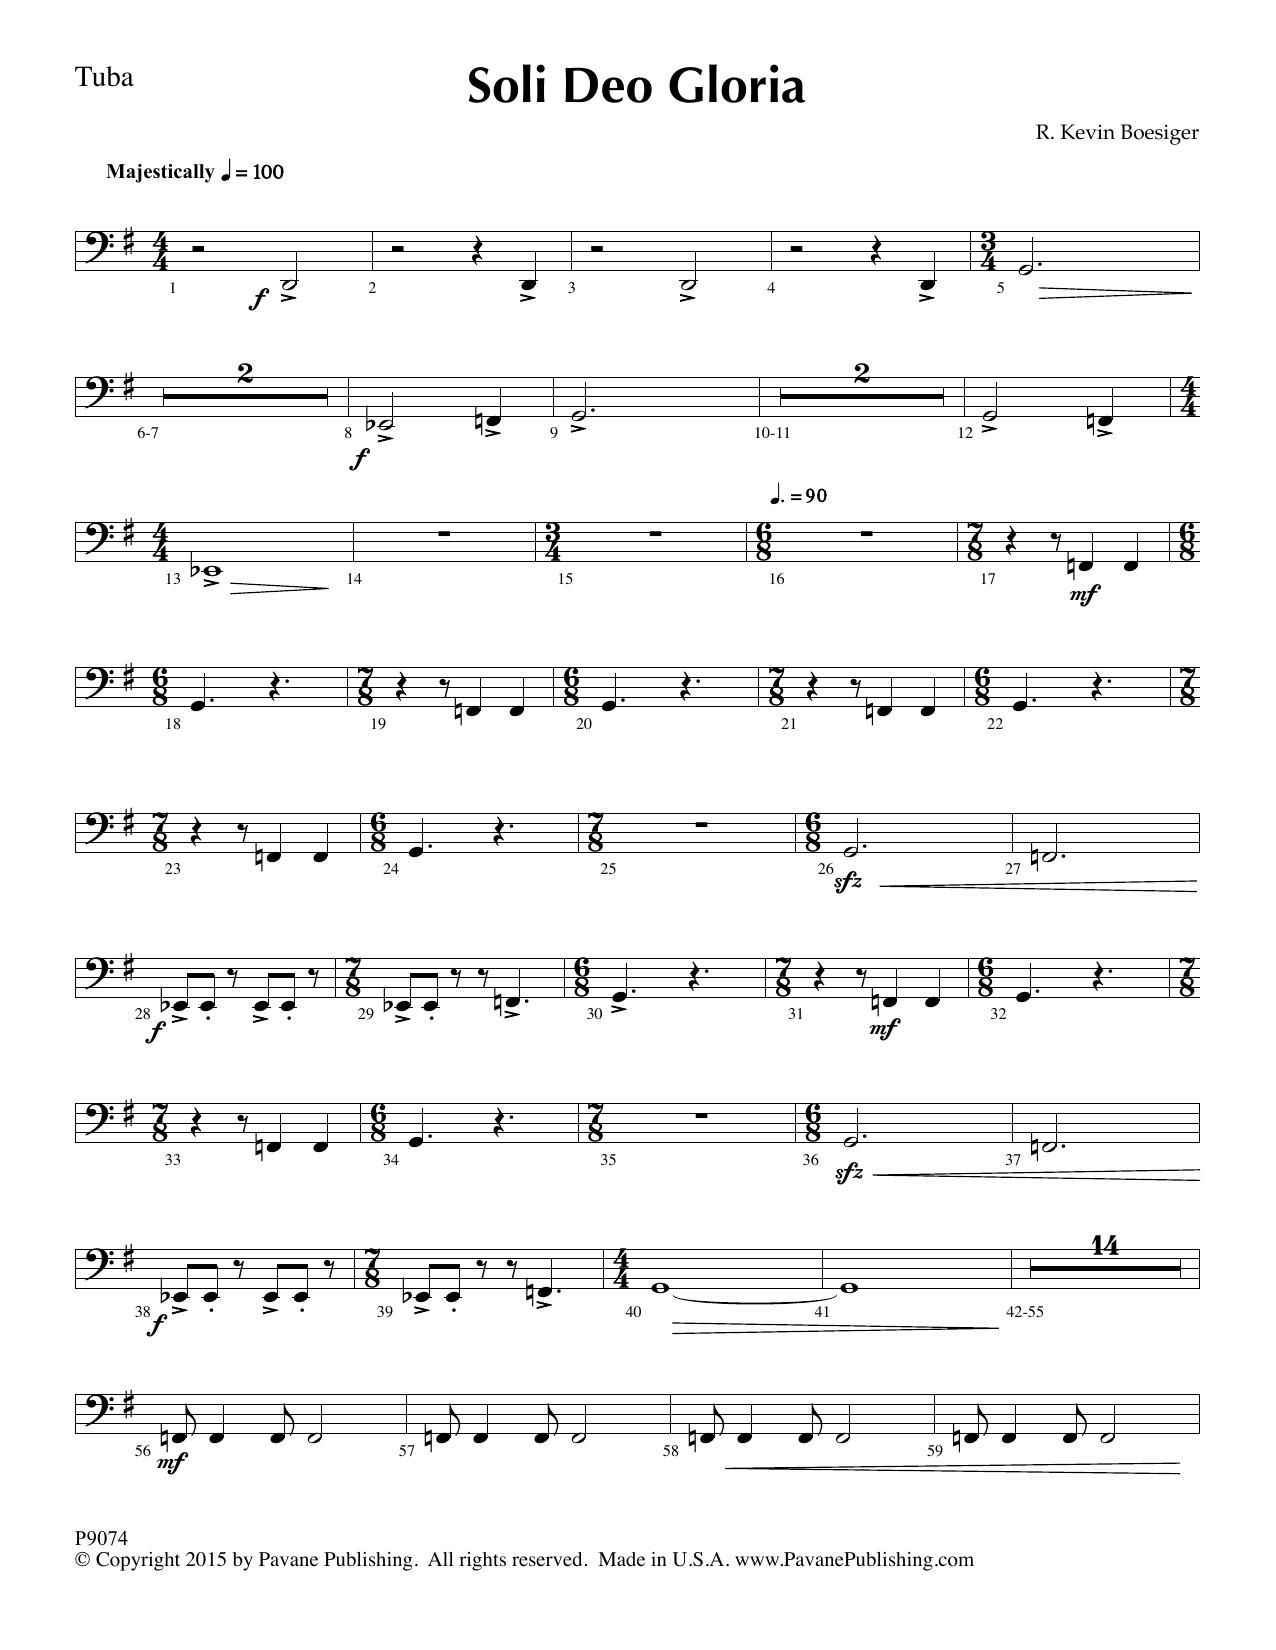 Soli Deo Gloria - Tuba Partituras Digitales